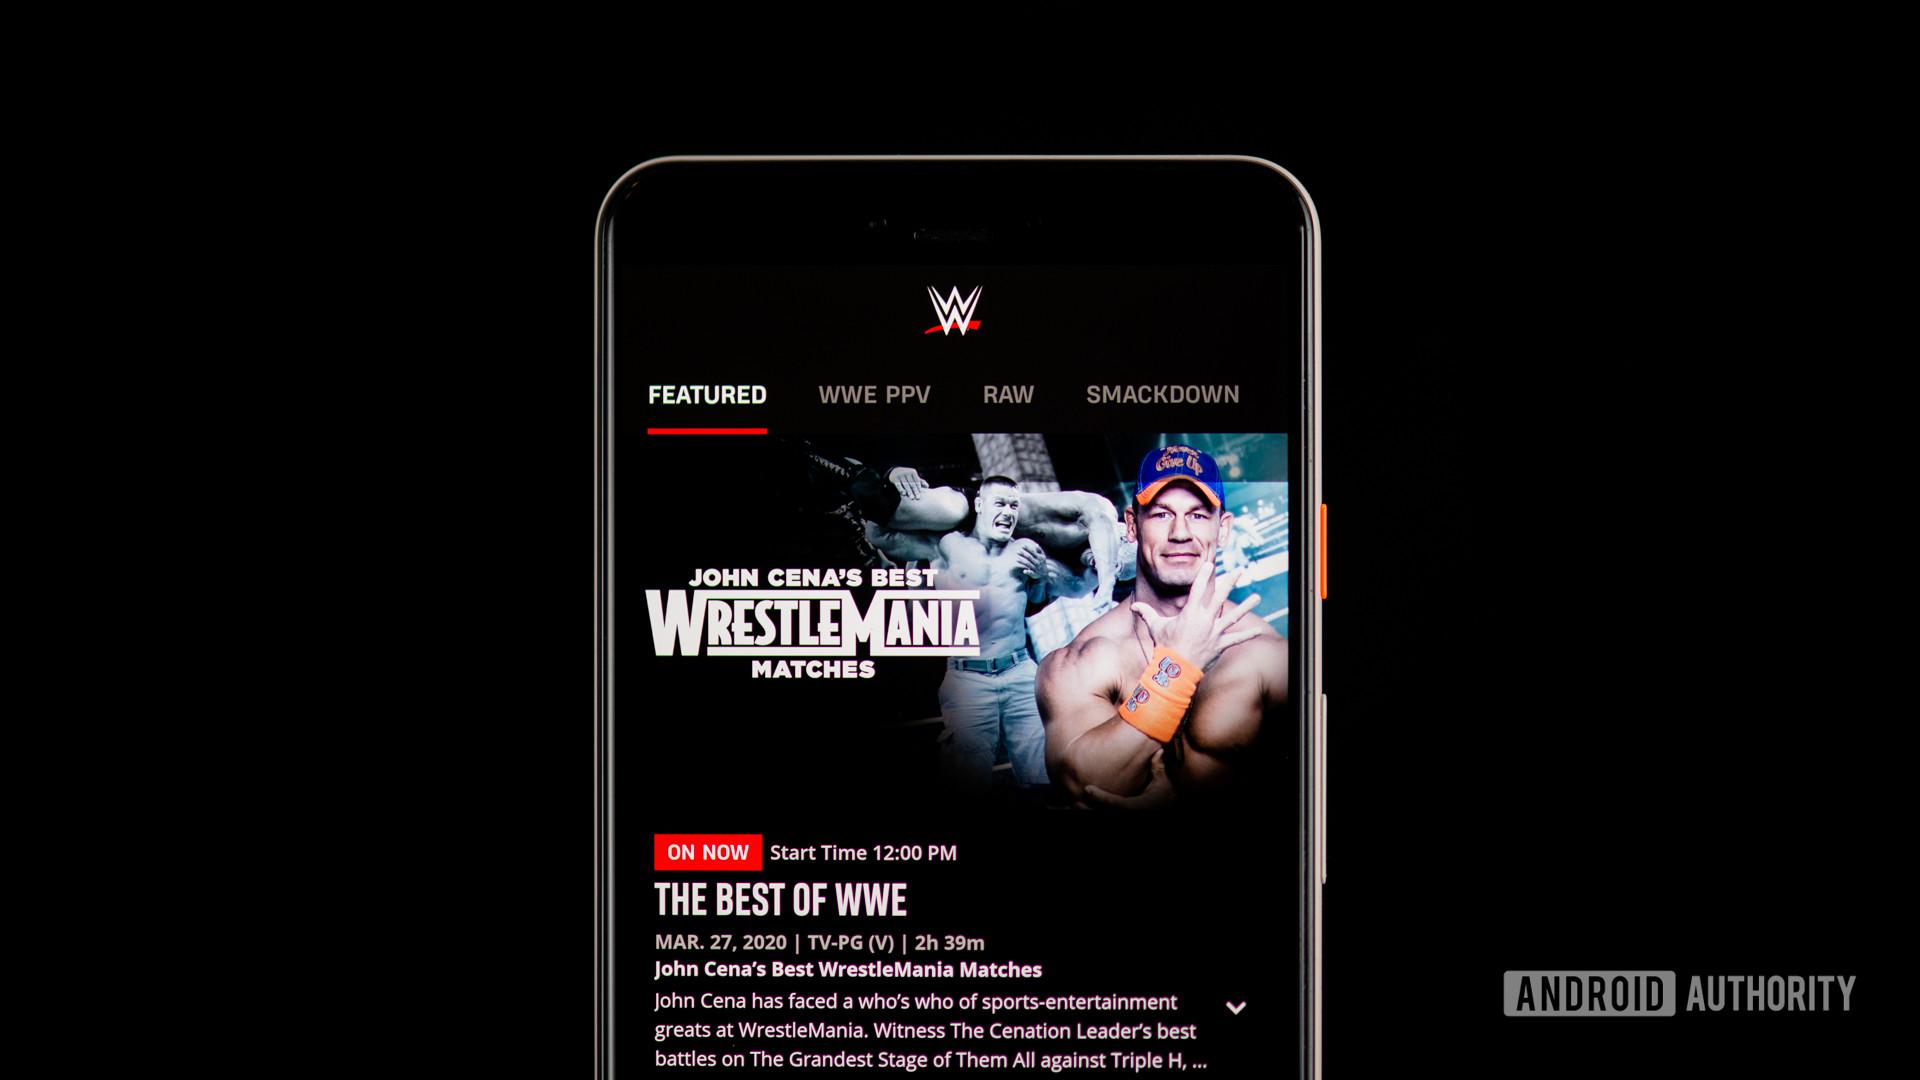 WWE stock photo with John Cena